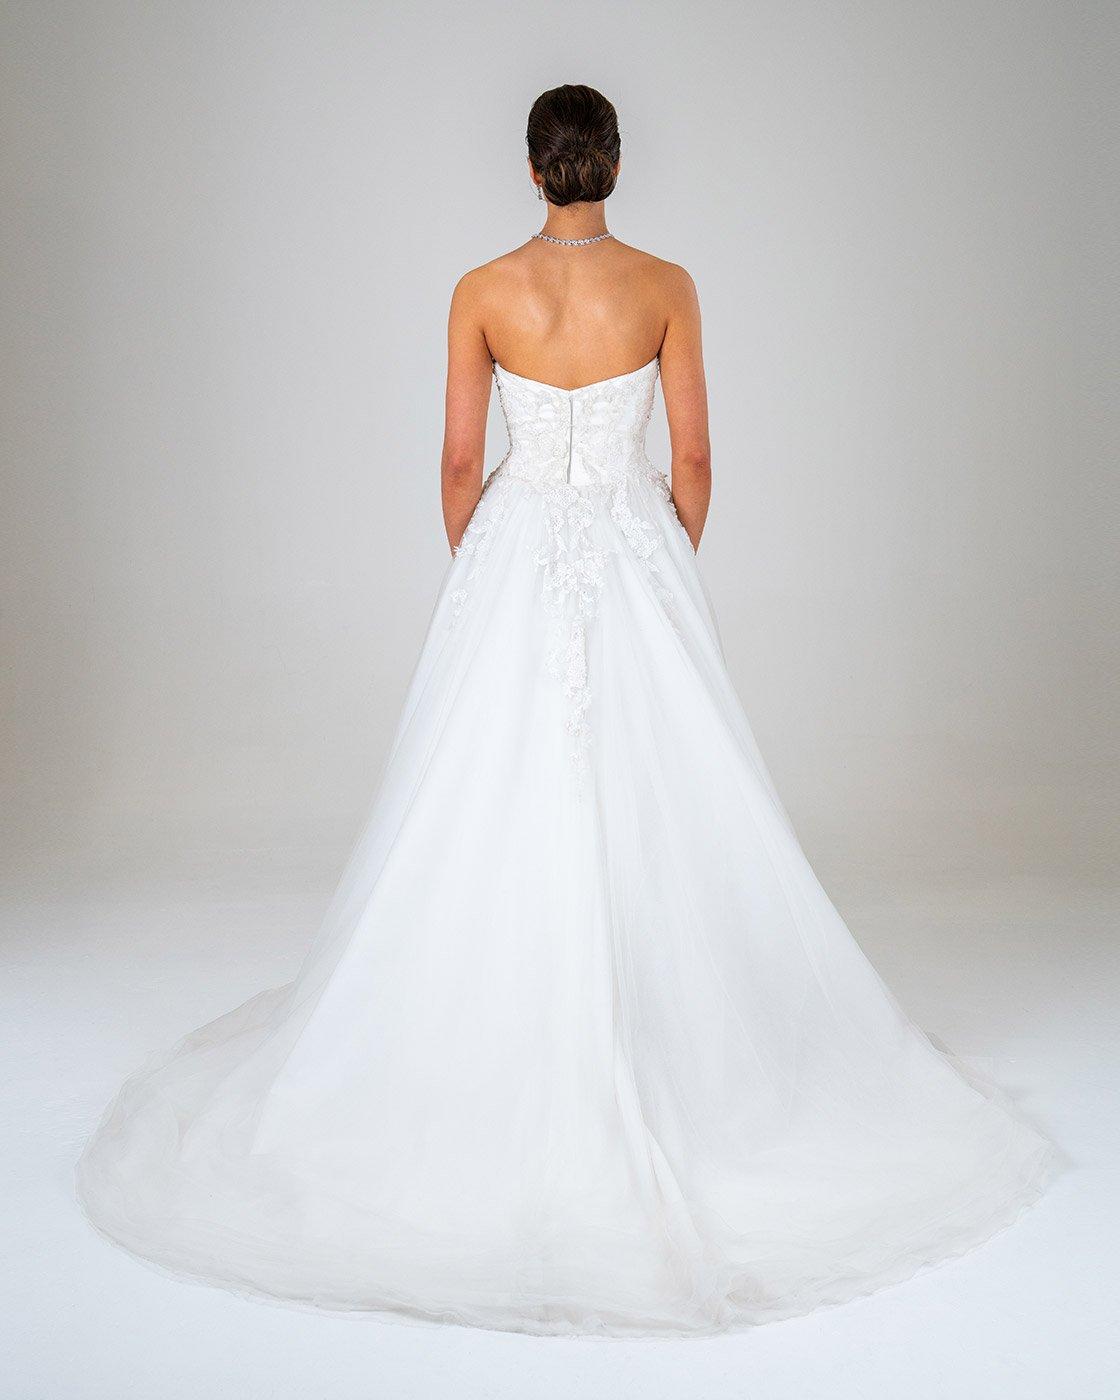 Princess Grace Wedding Dress.Princess Grace Brides Of Armadale